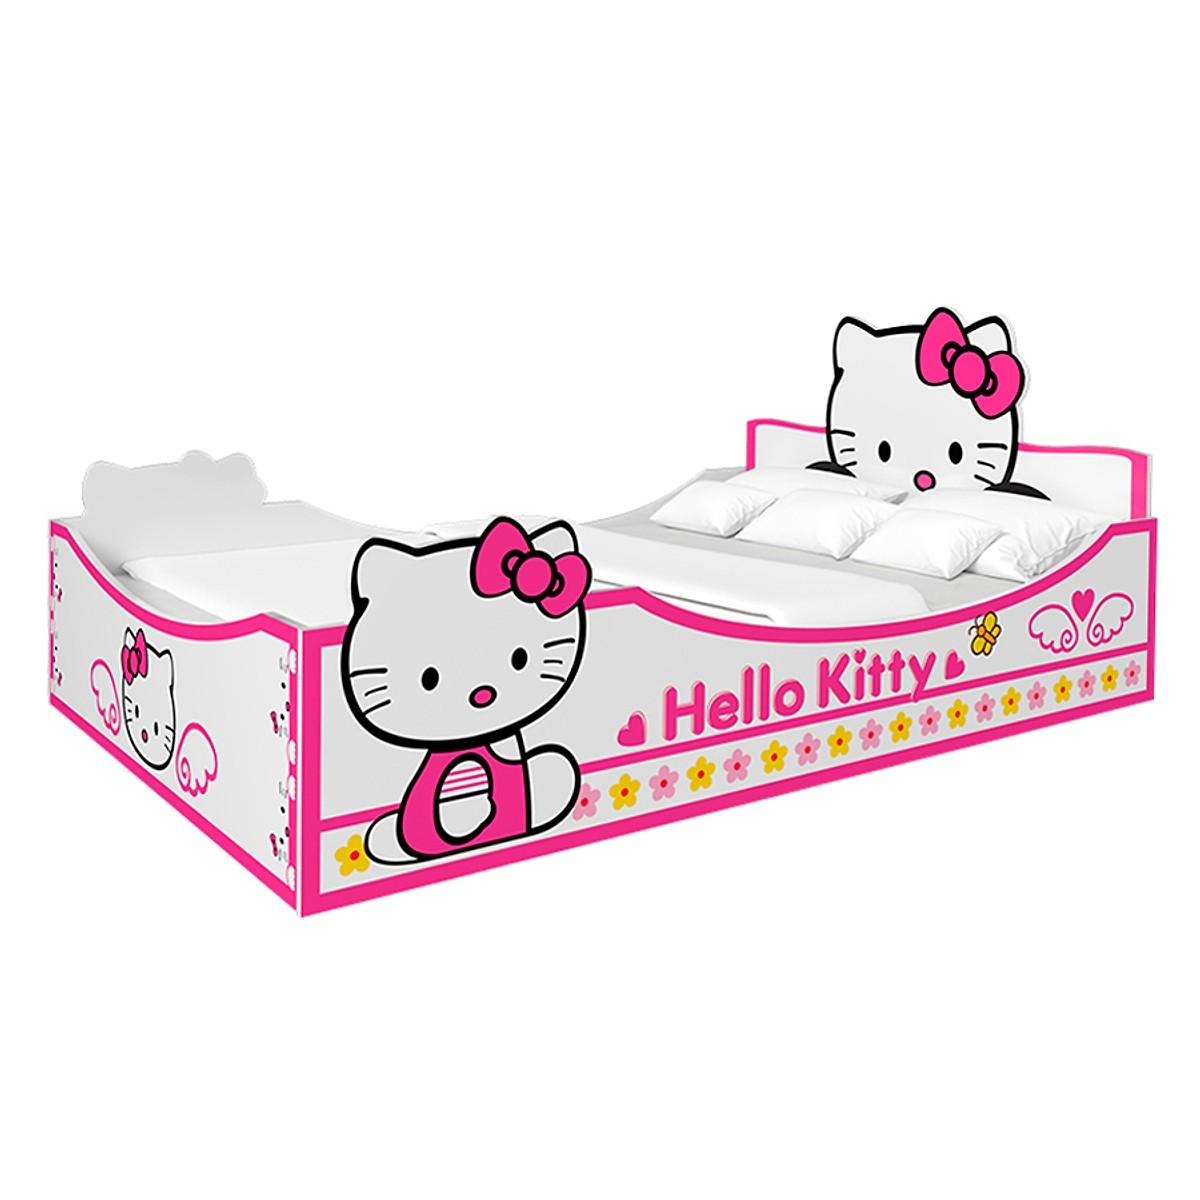 Giường Hello Kitty GD05